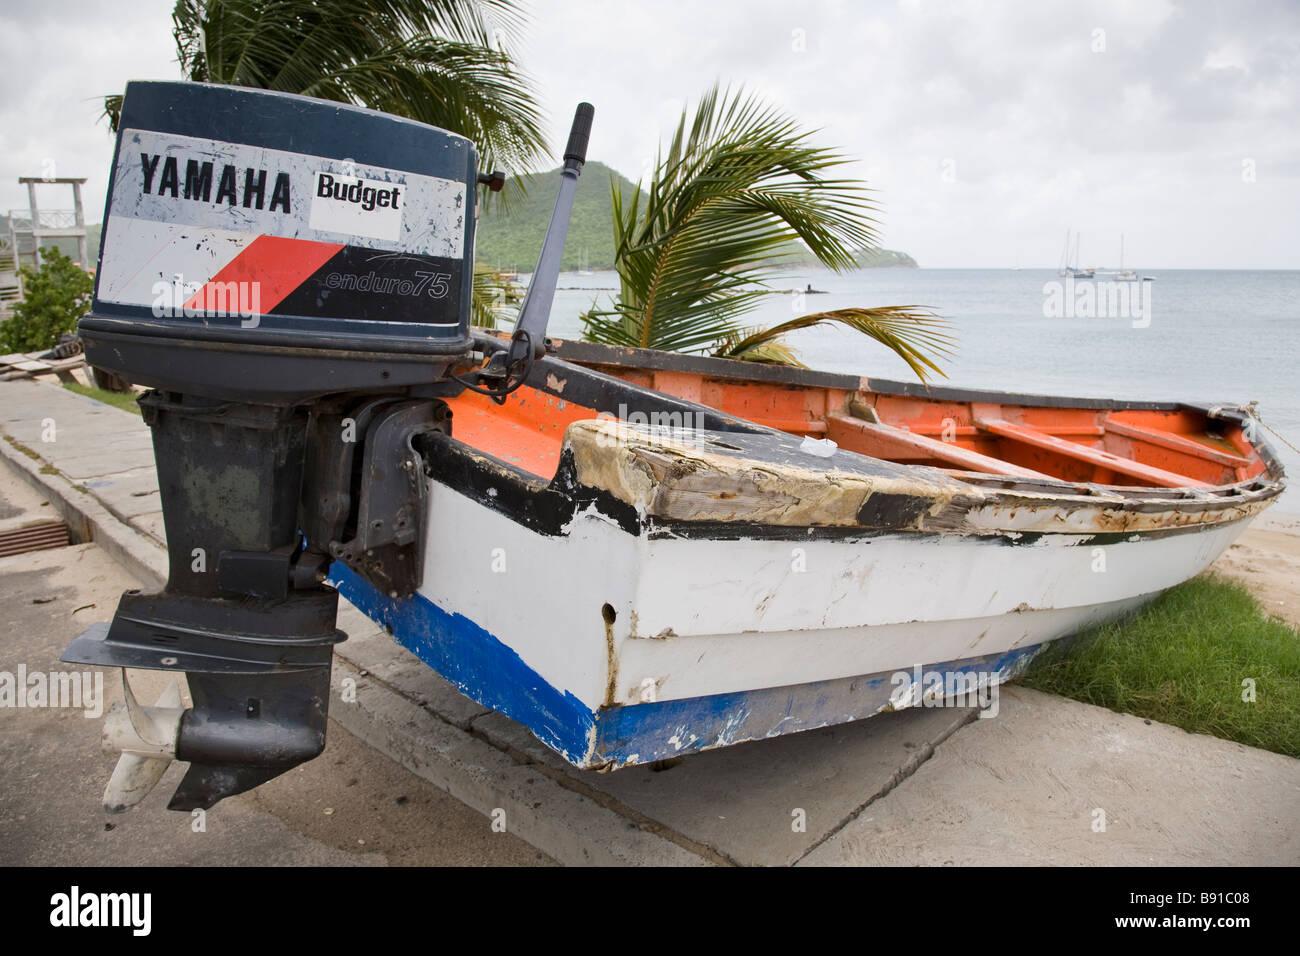 Outboard Motor Stockfotos & Outboard Motor Bilder - Alamy